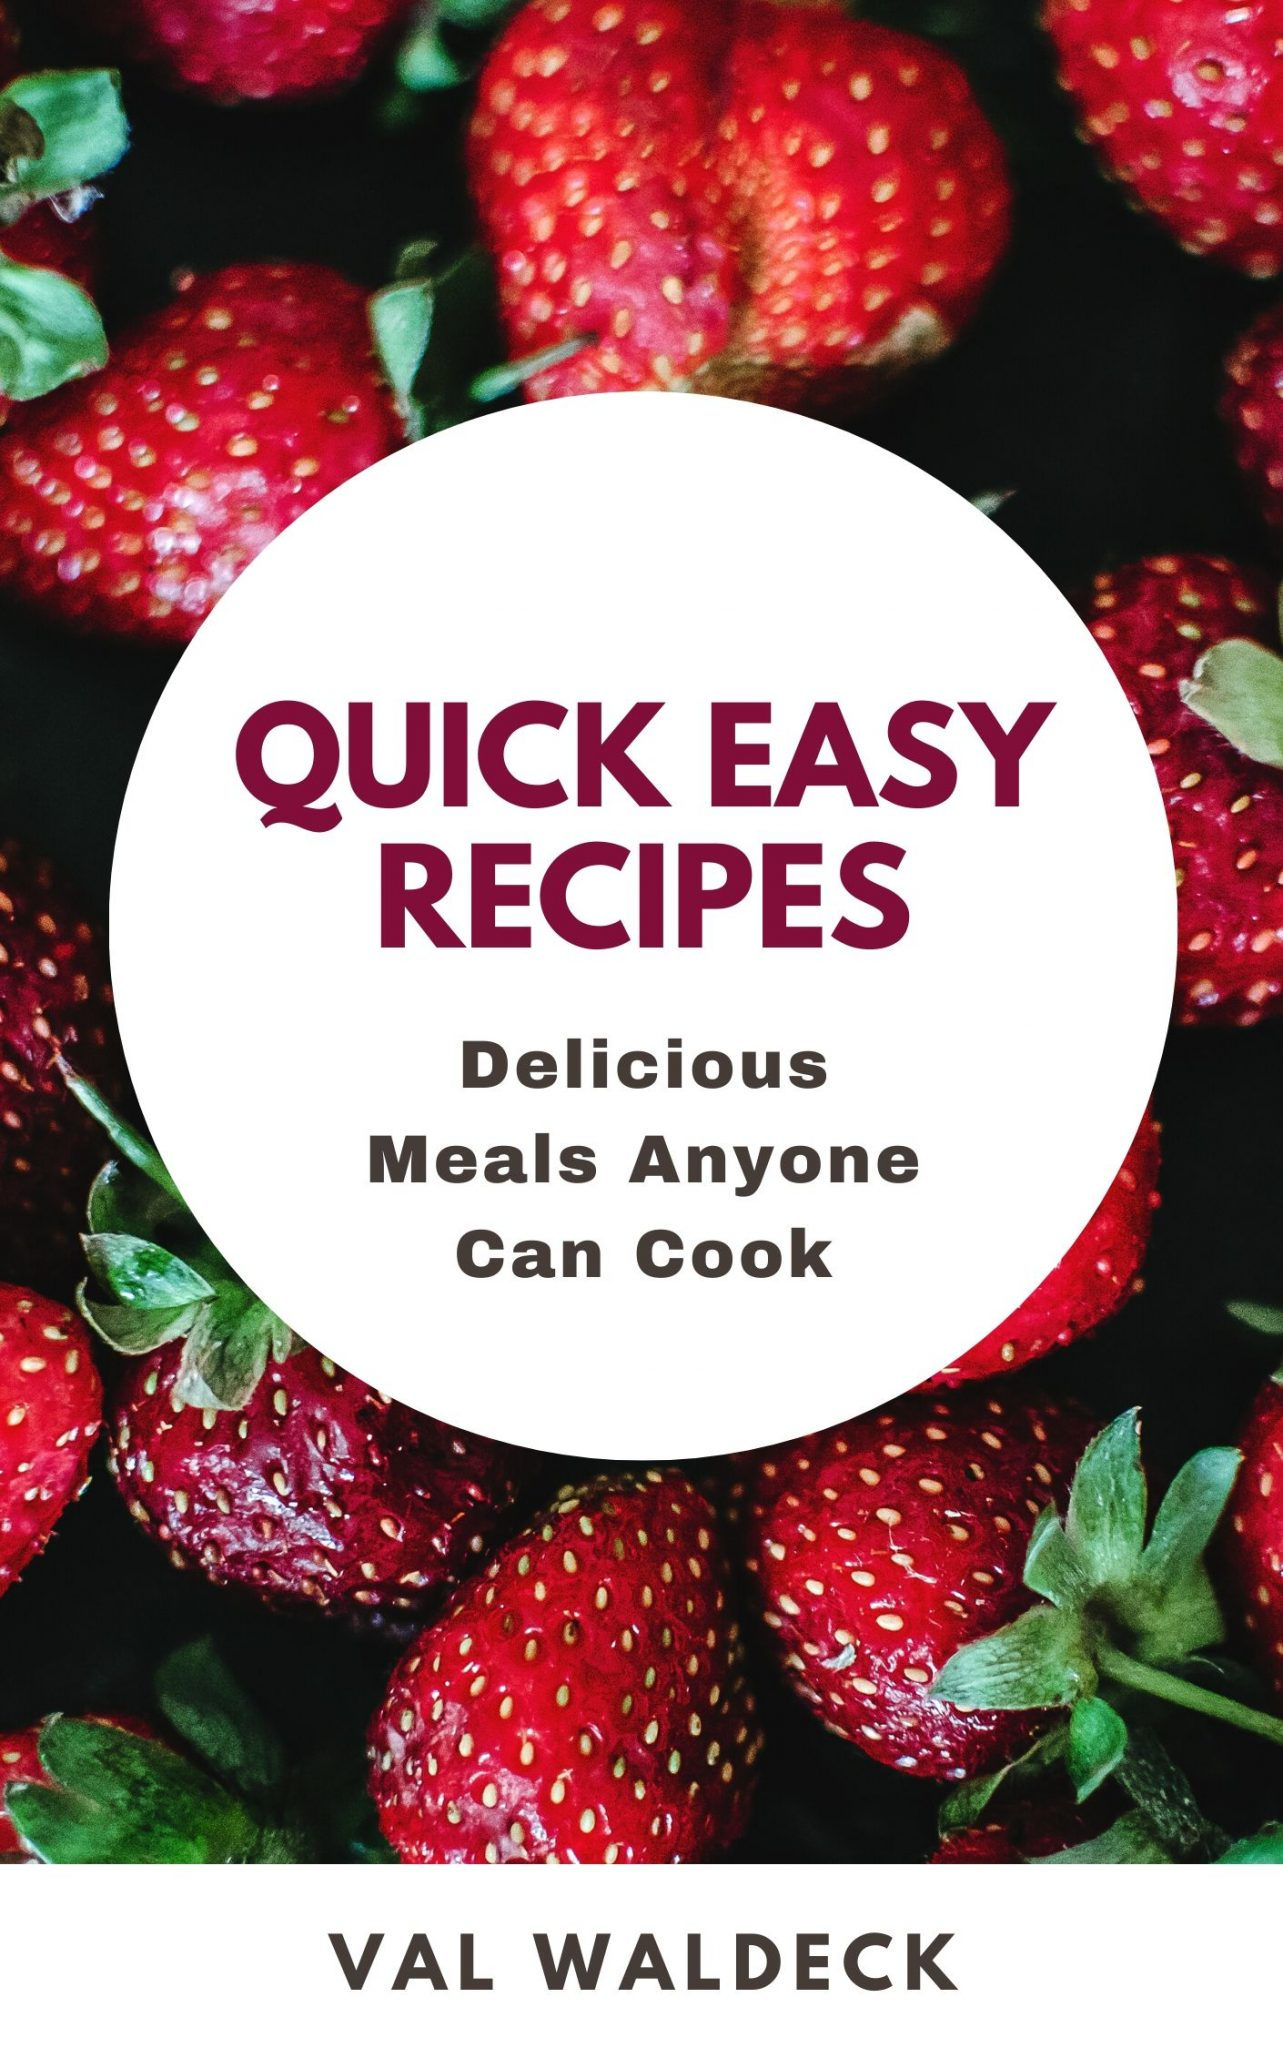 Quick Easy Recipes Image